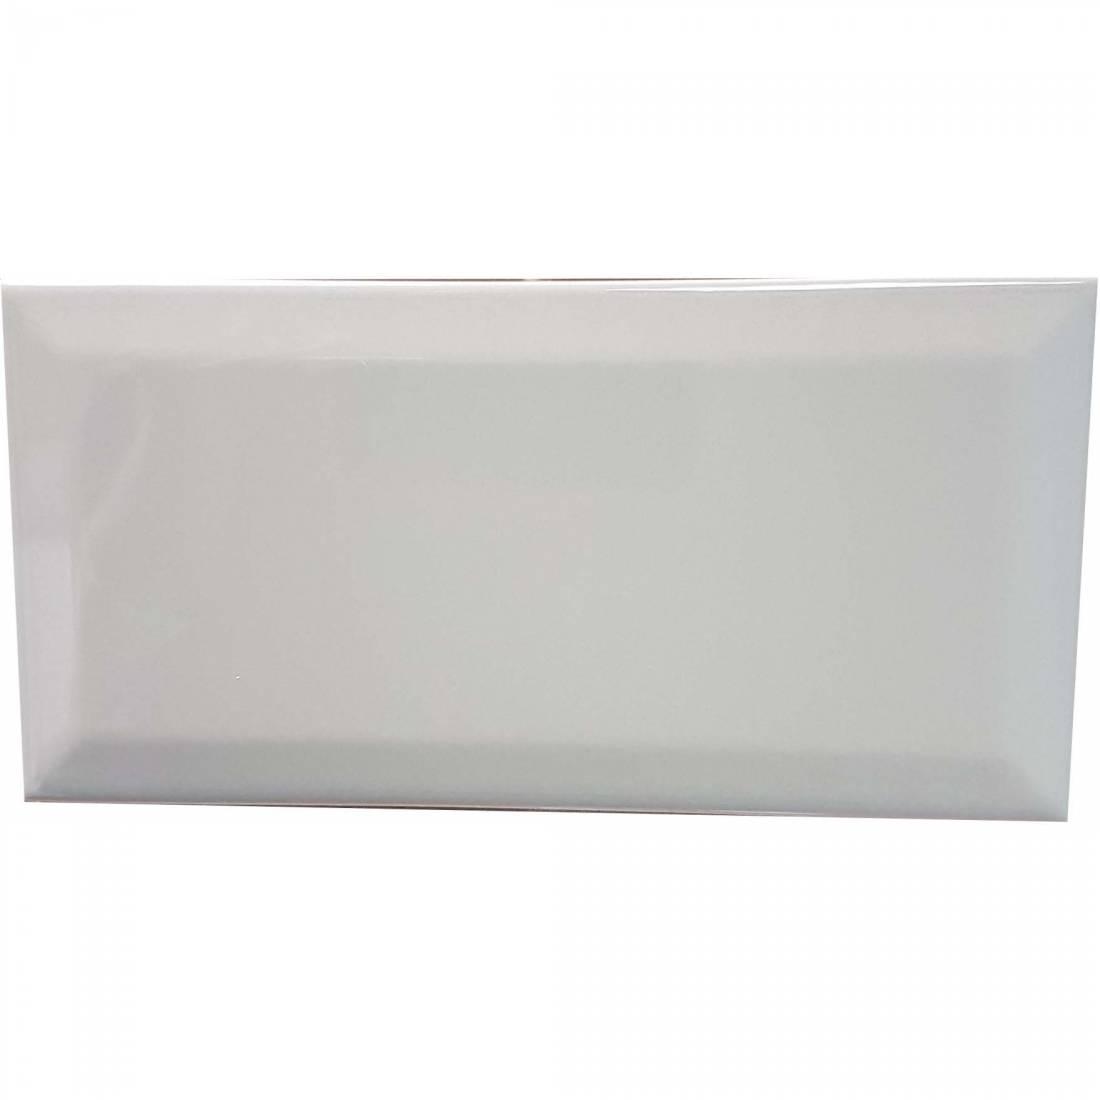 Biselado 10x20 Grey Gloss 1